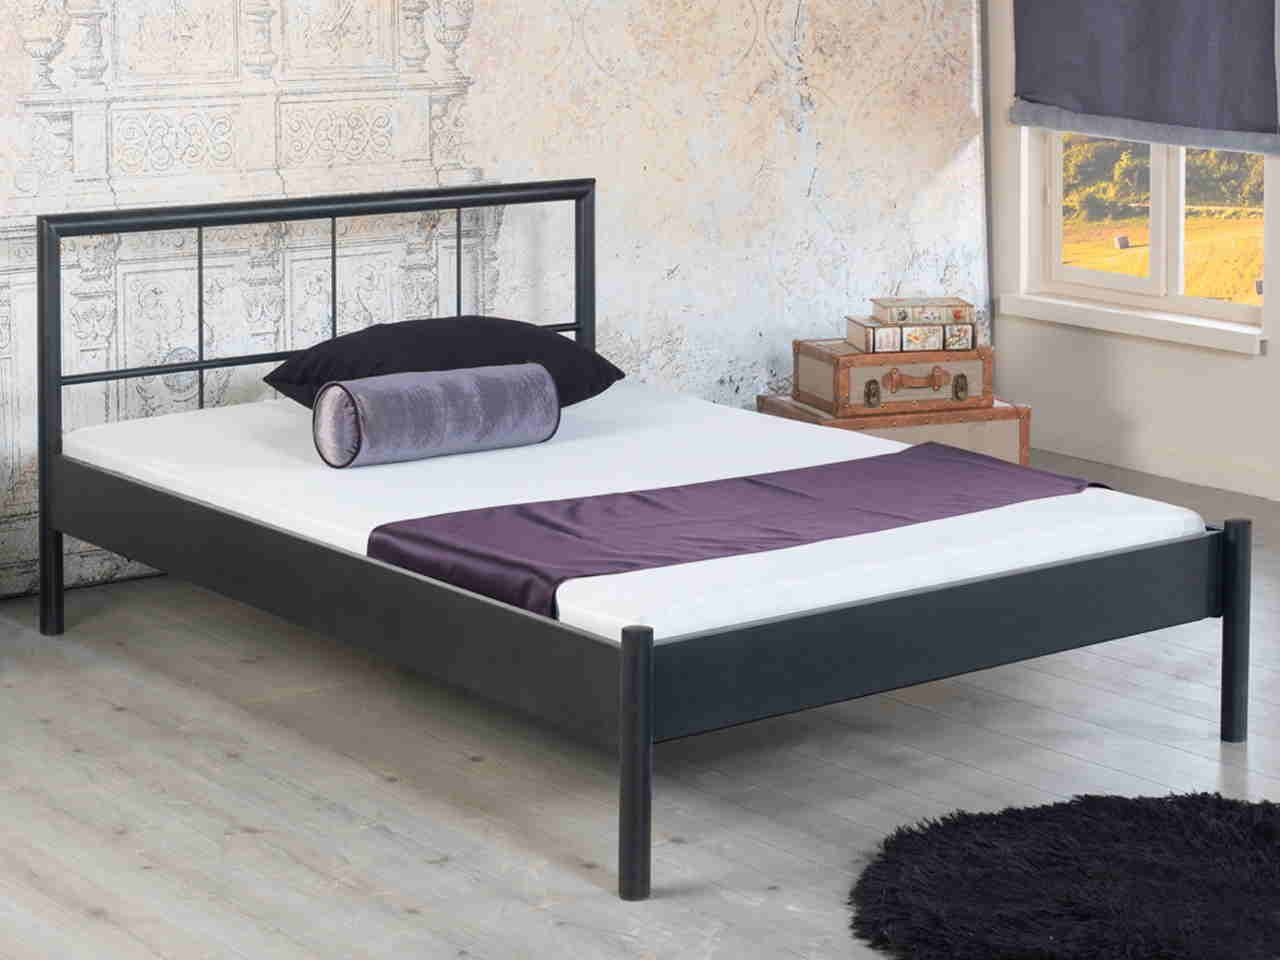 Metallbett Daisy In 2020 Ikea Metallbett Schwarz Bett Ideen Bett